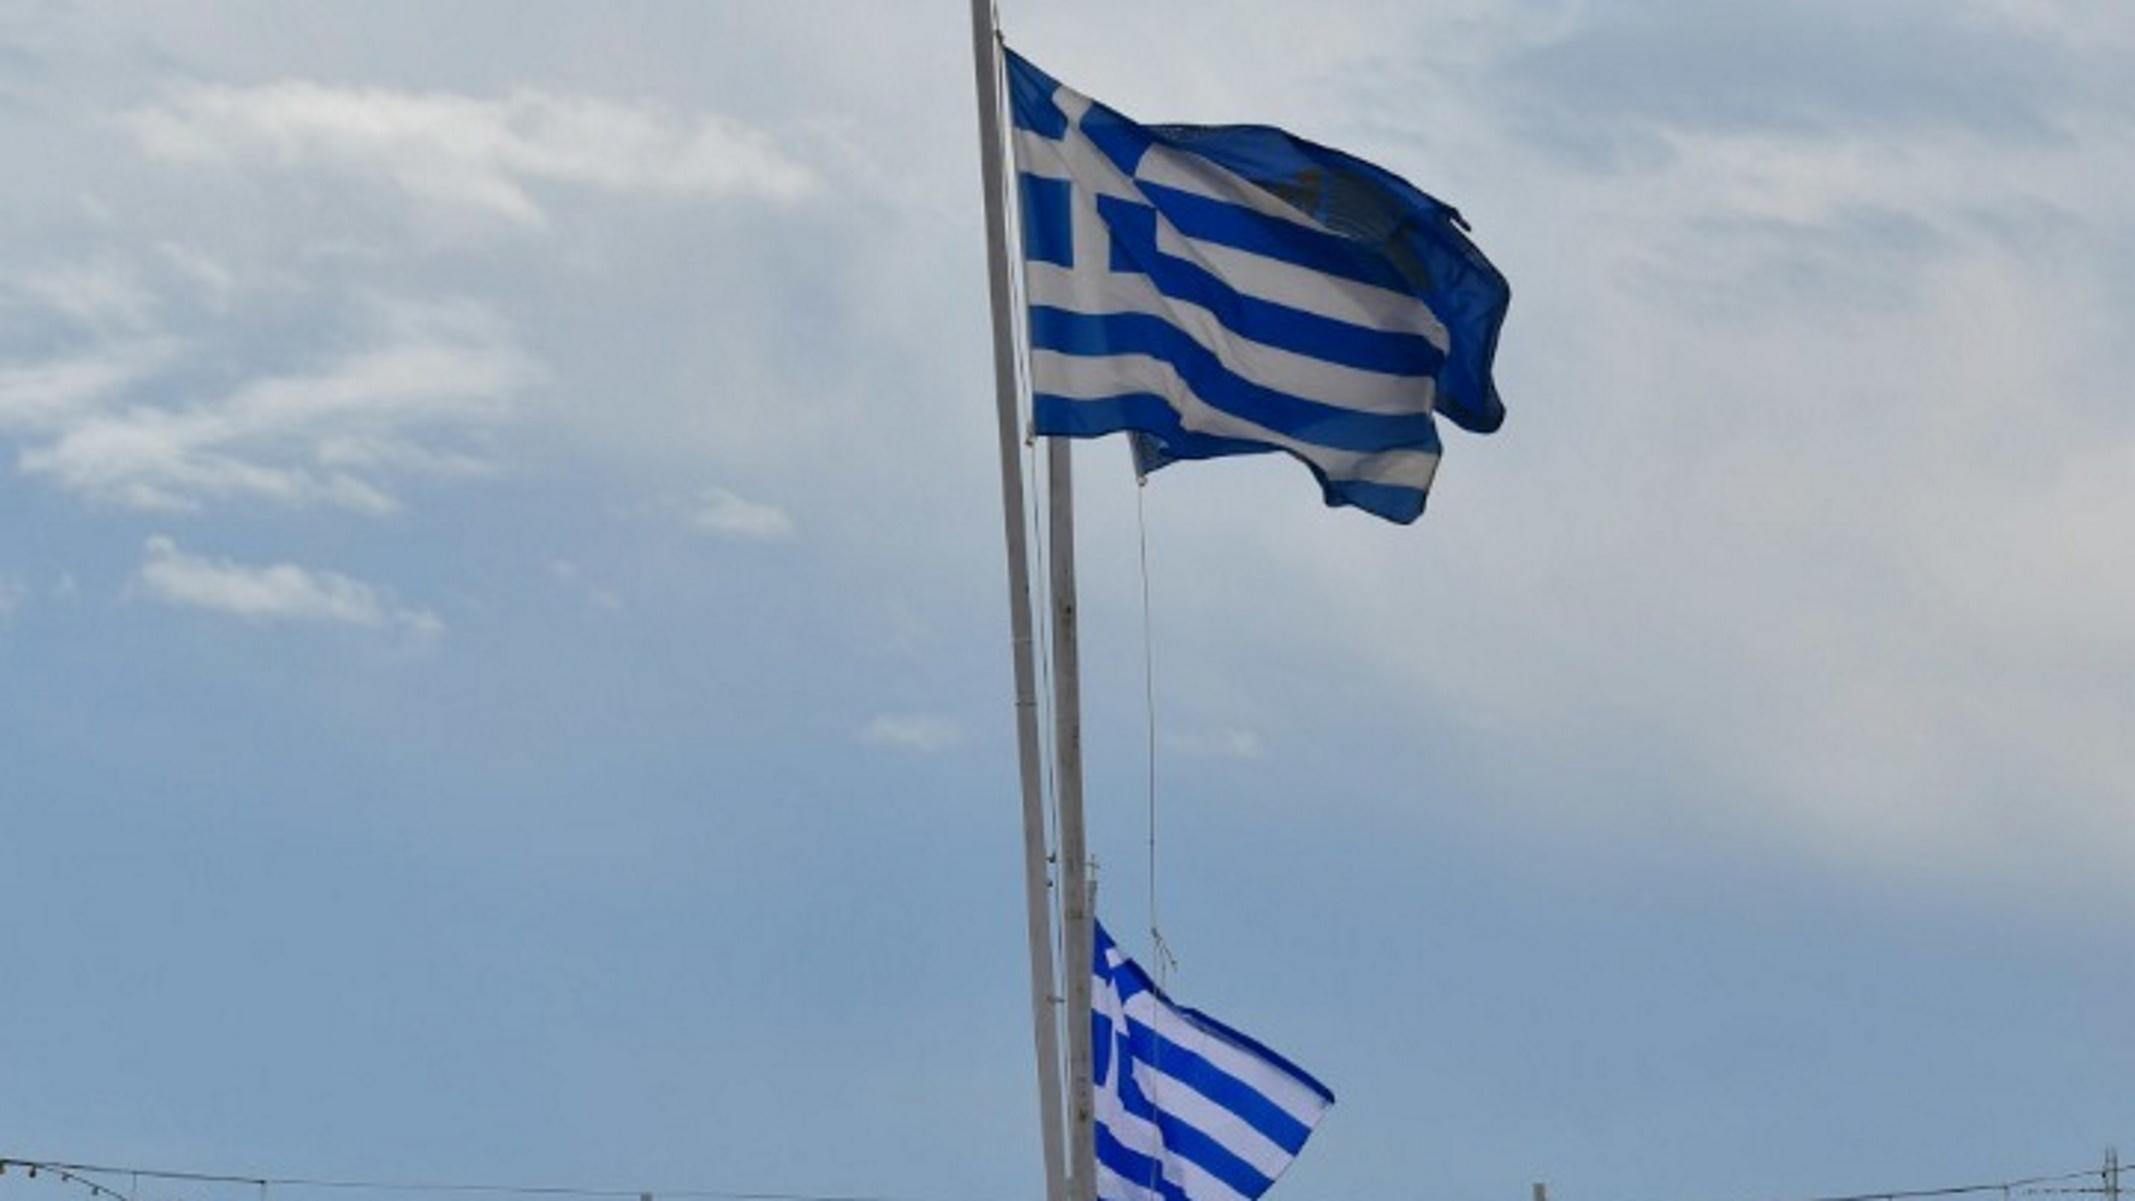 Bloomberg: Η Ελλάδα ένας από τους πιο περιζήτητους δανειολήπτες στην Ευρώπη